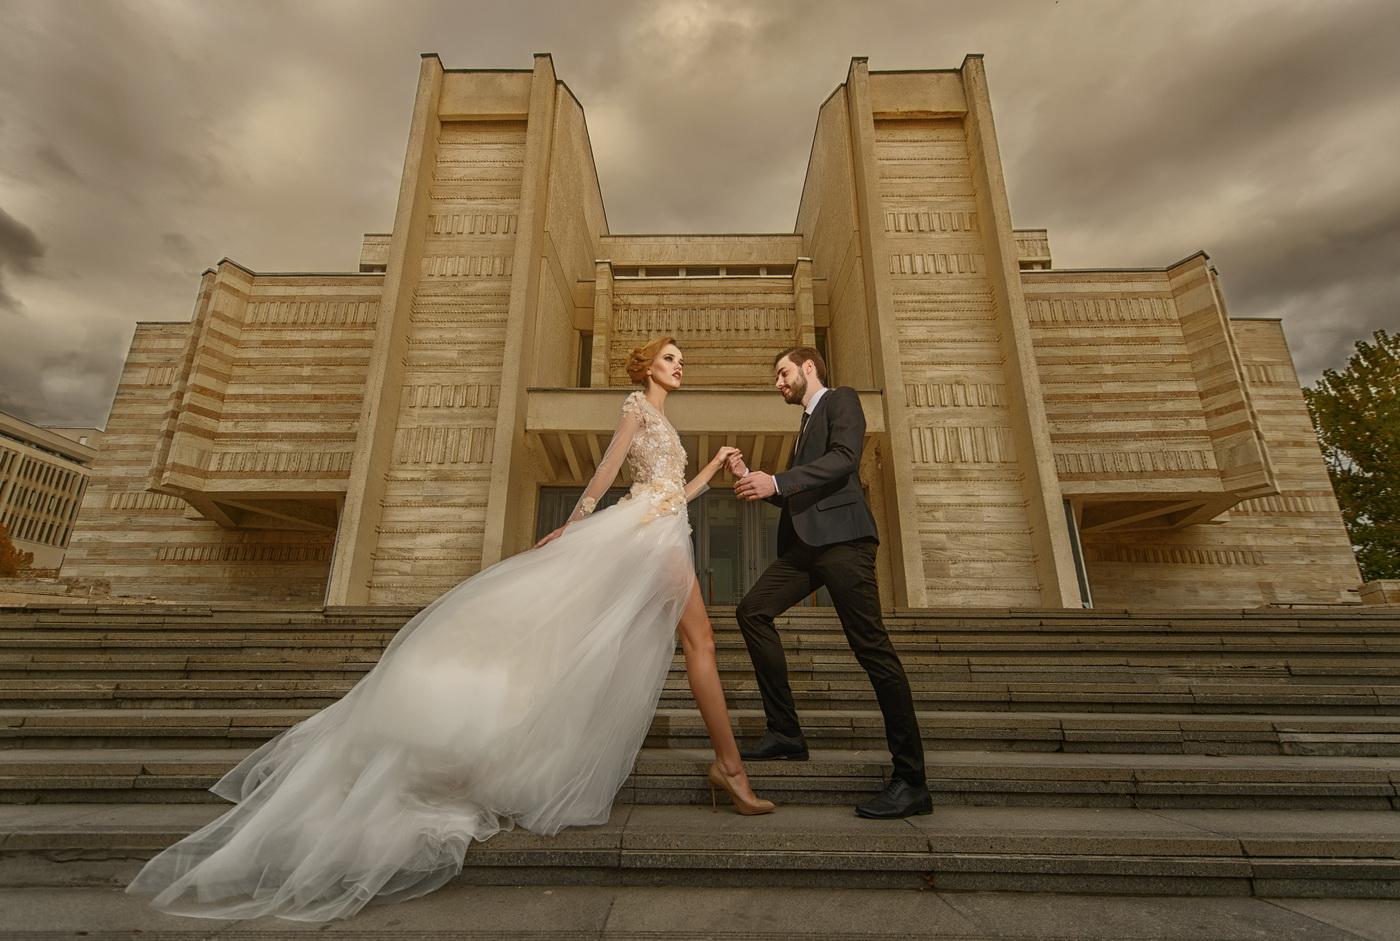 Destination Wedding Photographer_Marian Sterea_098.jpg